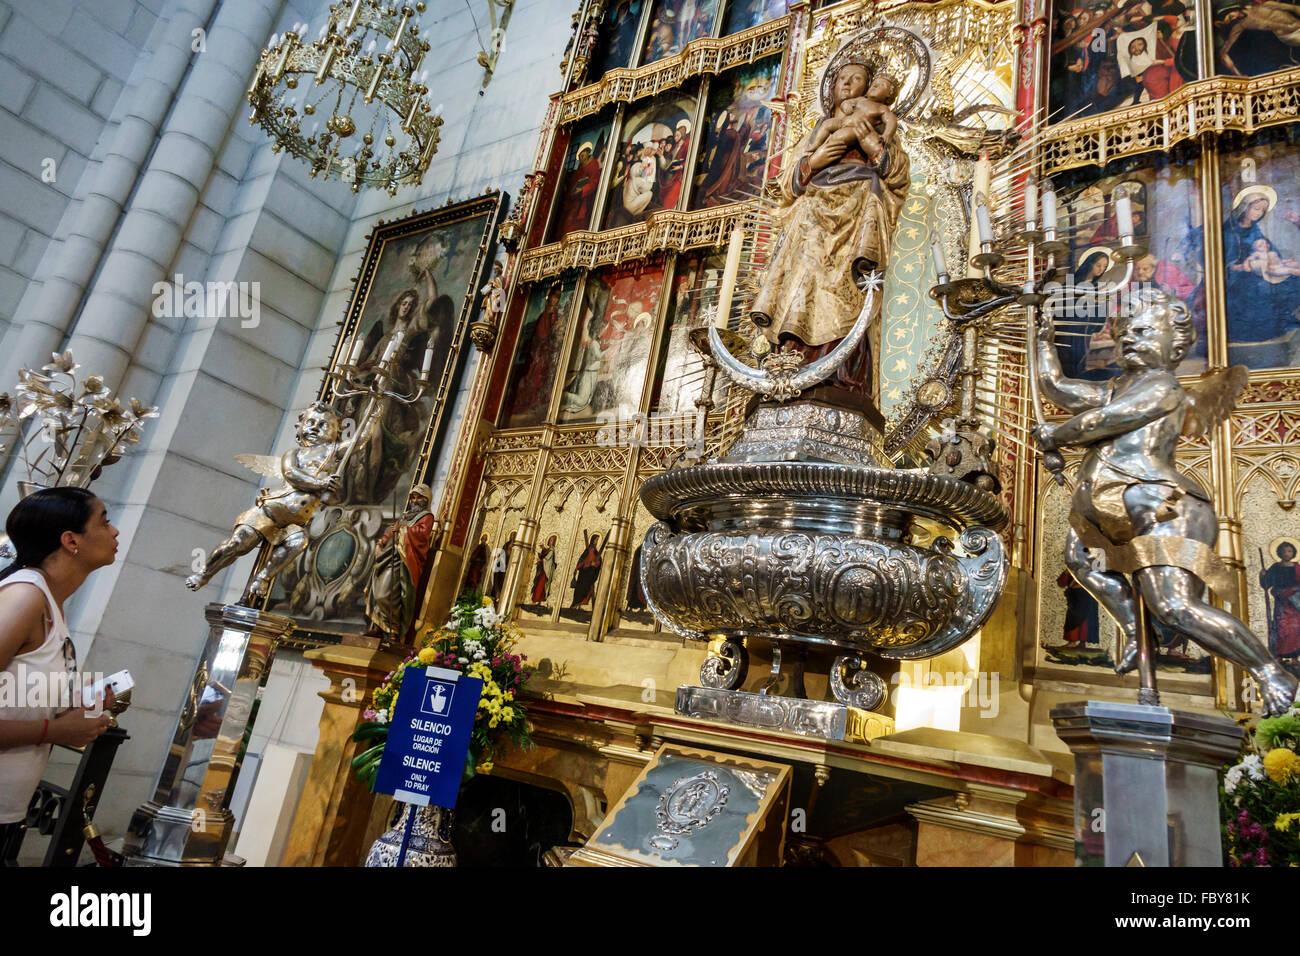 Madrid Spain Europe Spanish Hispanic Centro Catedral Santa Maria la Real de La Almudena consecrated cathedral Catholic - Stock Image